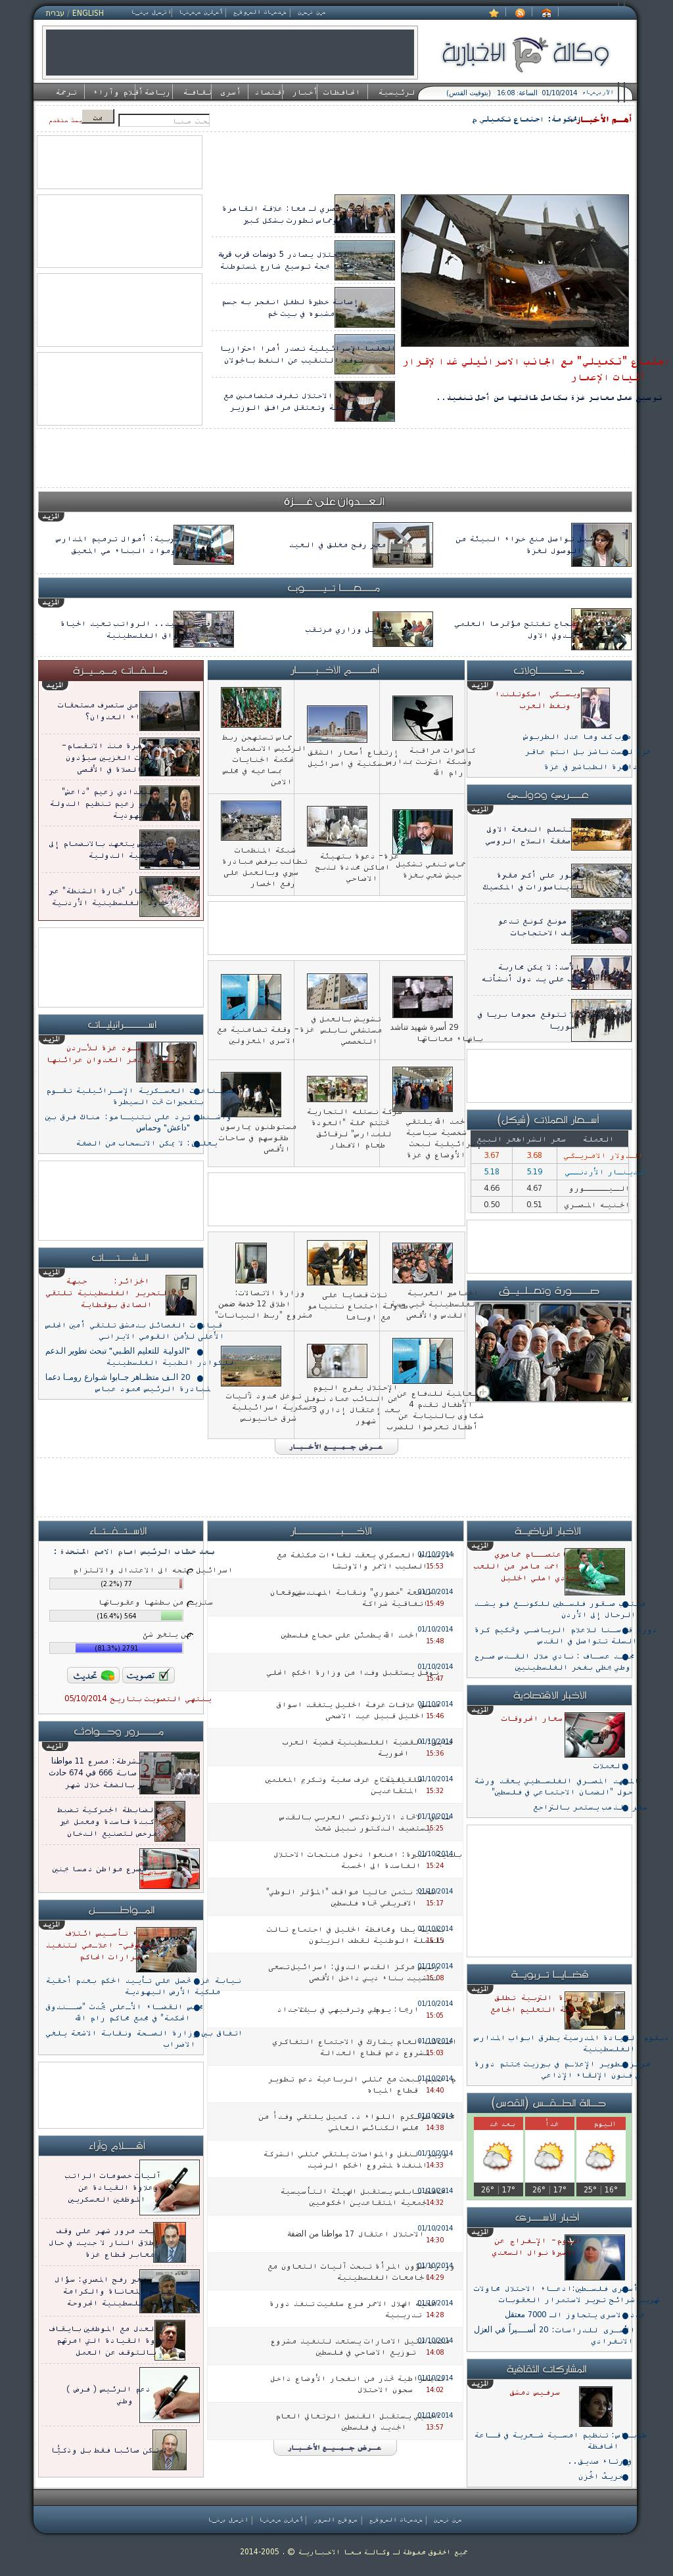 Ma'an News at Wednesday Oct. 1, 2014, 1:08 p.m. UTC